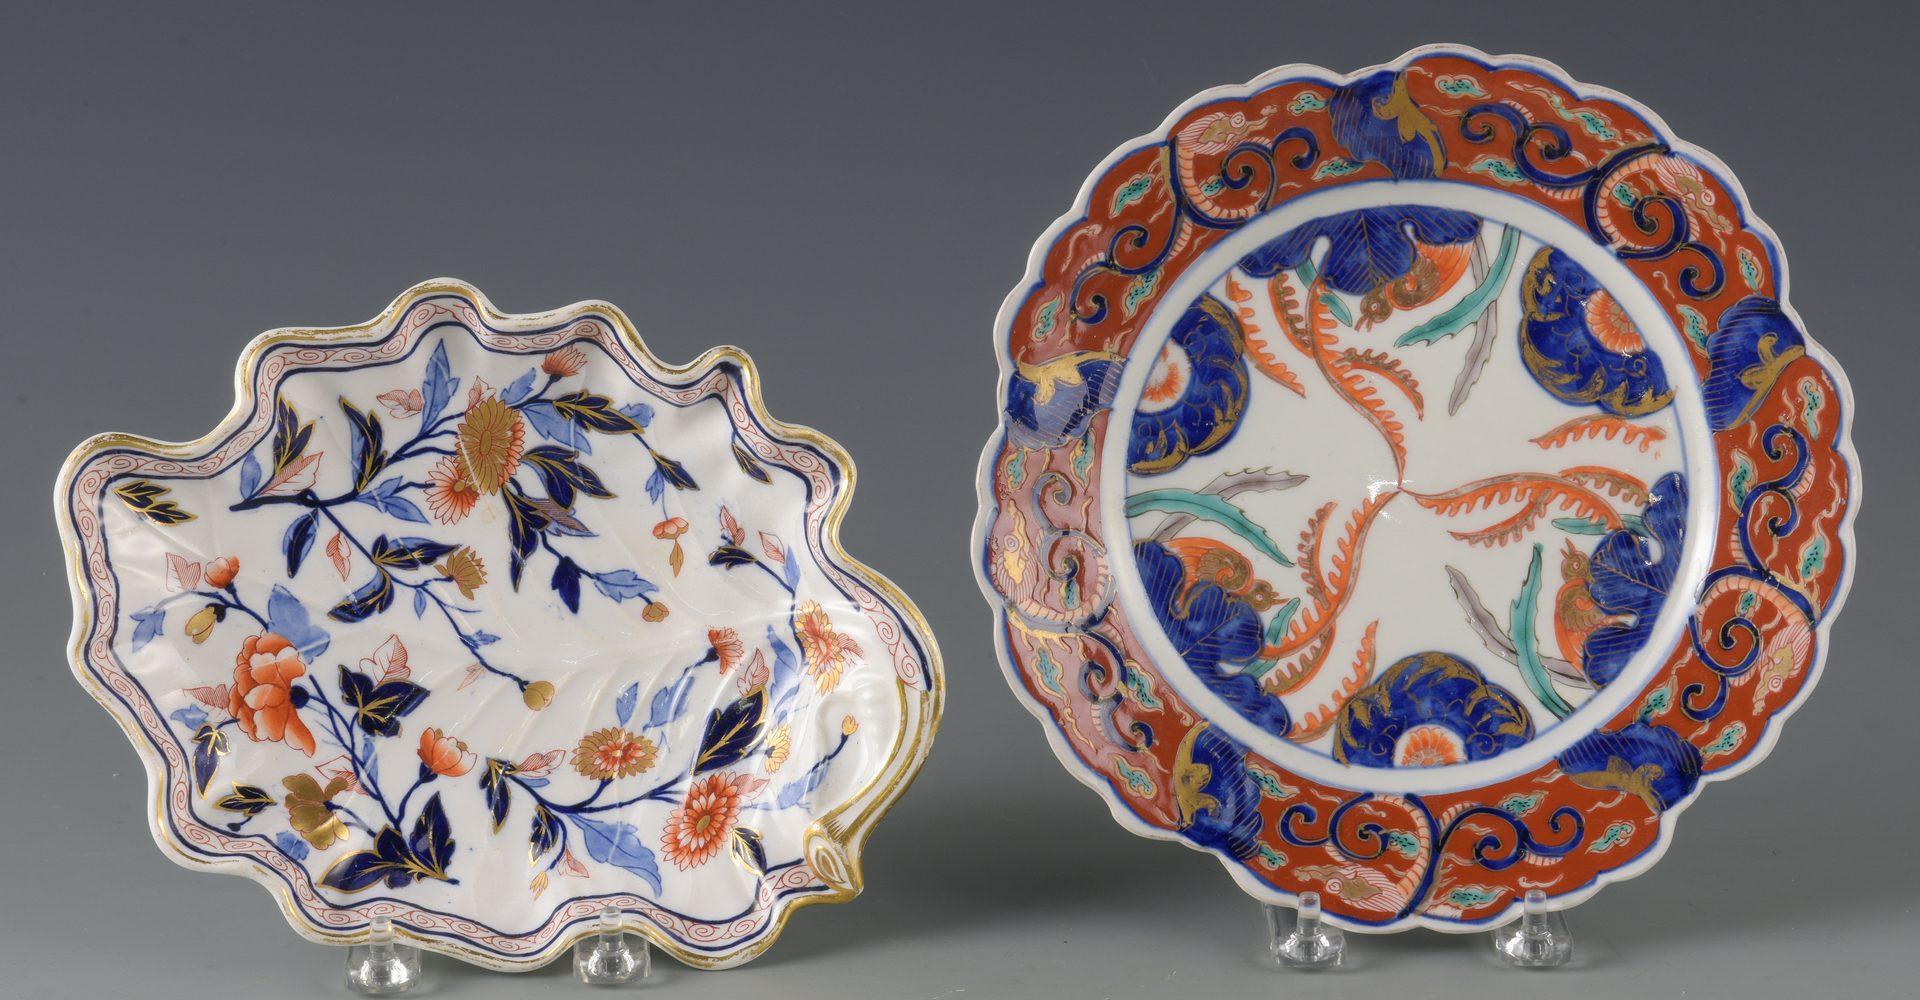 Lot 592: Imari Palette Porcelain Items, mostly Asian